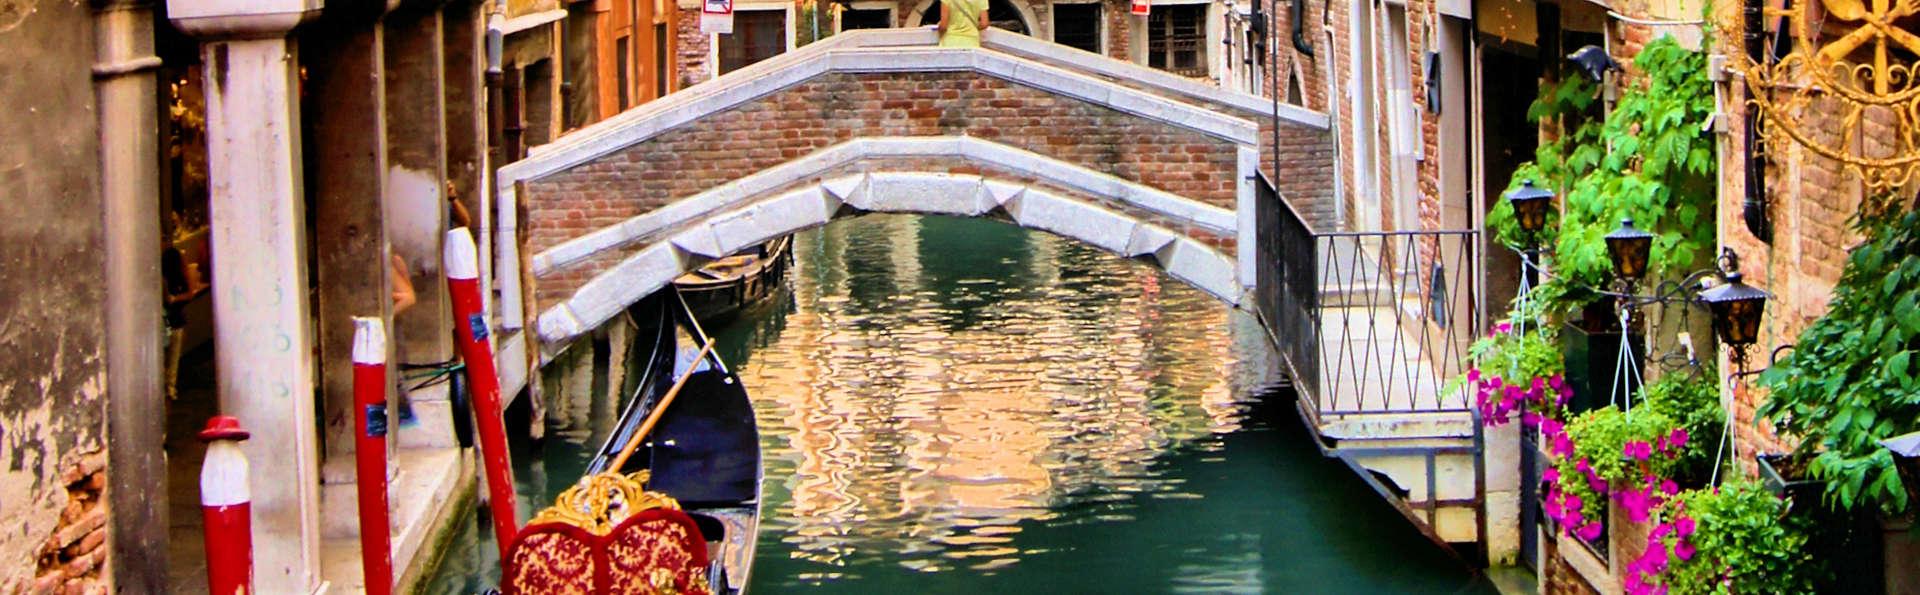 Albergo La Meridiana - Edit_Venecia2.jpg